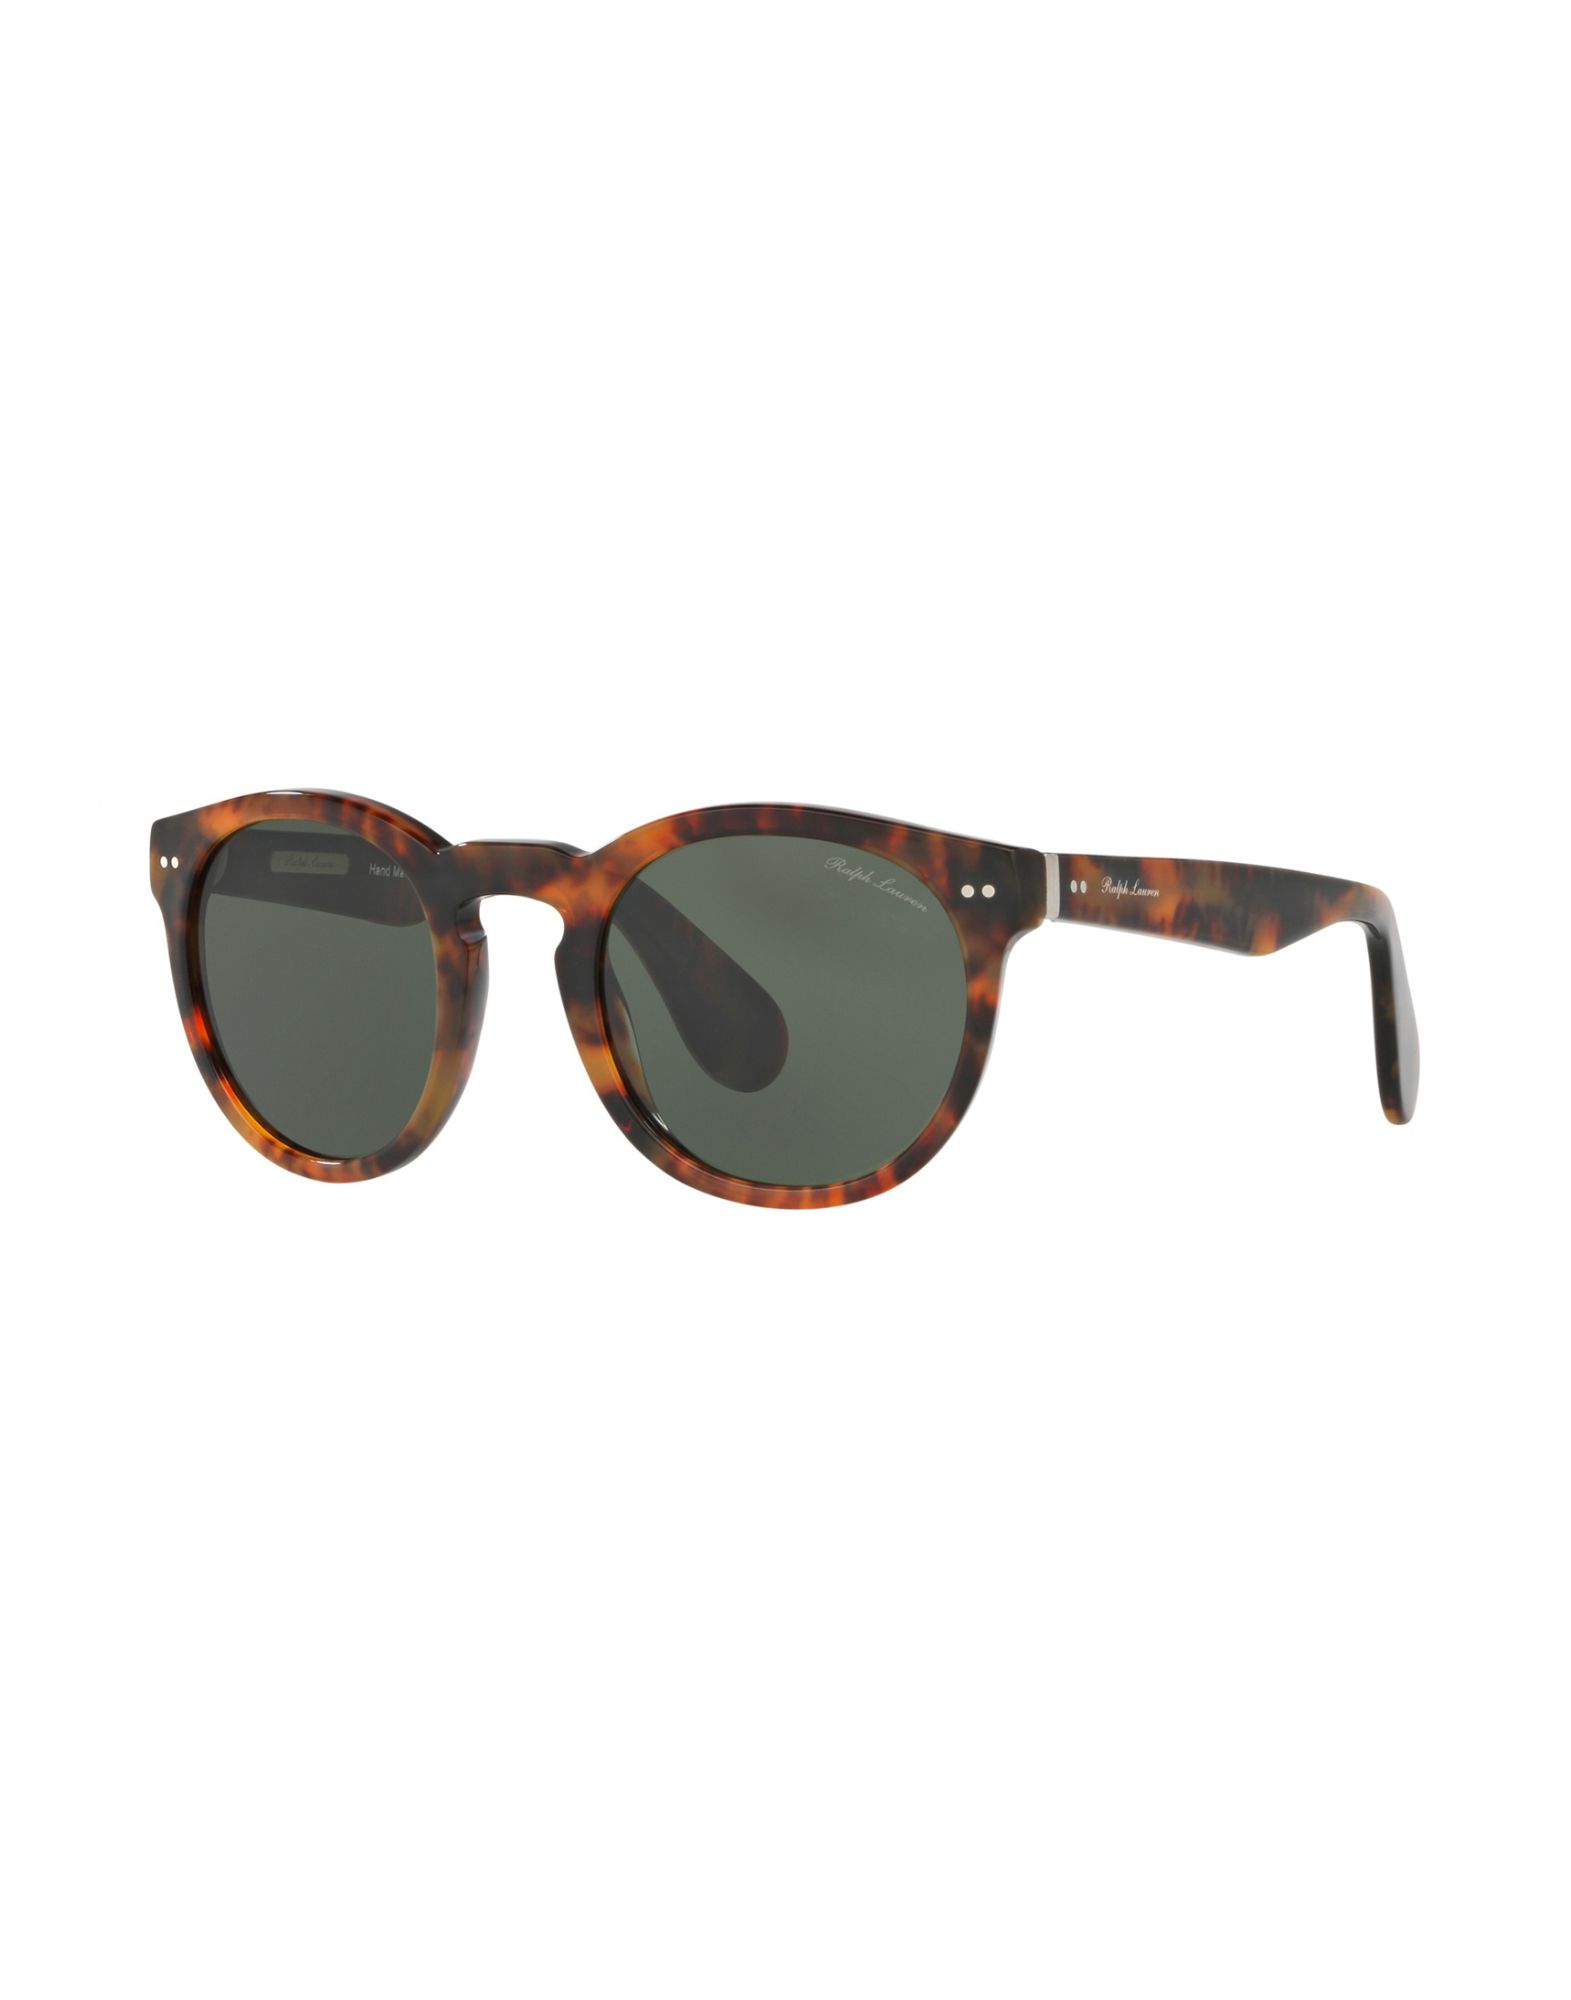 Occhiali Da Sole Ralph Lauren Rl8146p - Uomo - Acquista online su